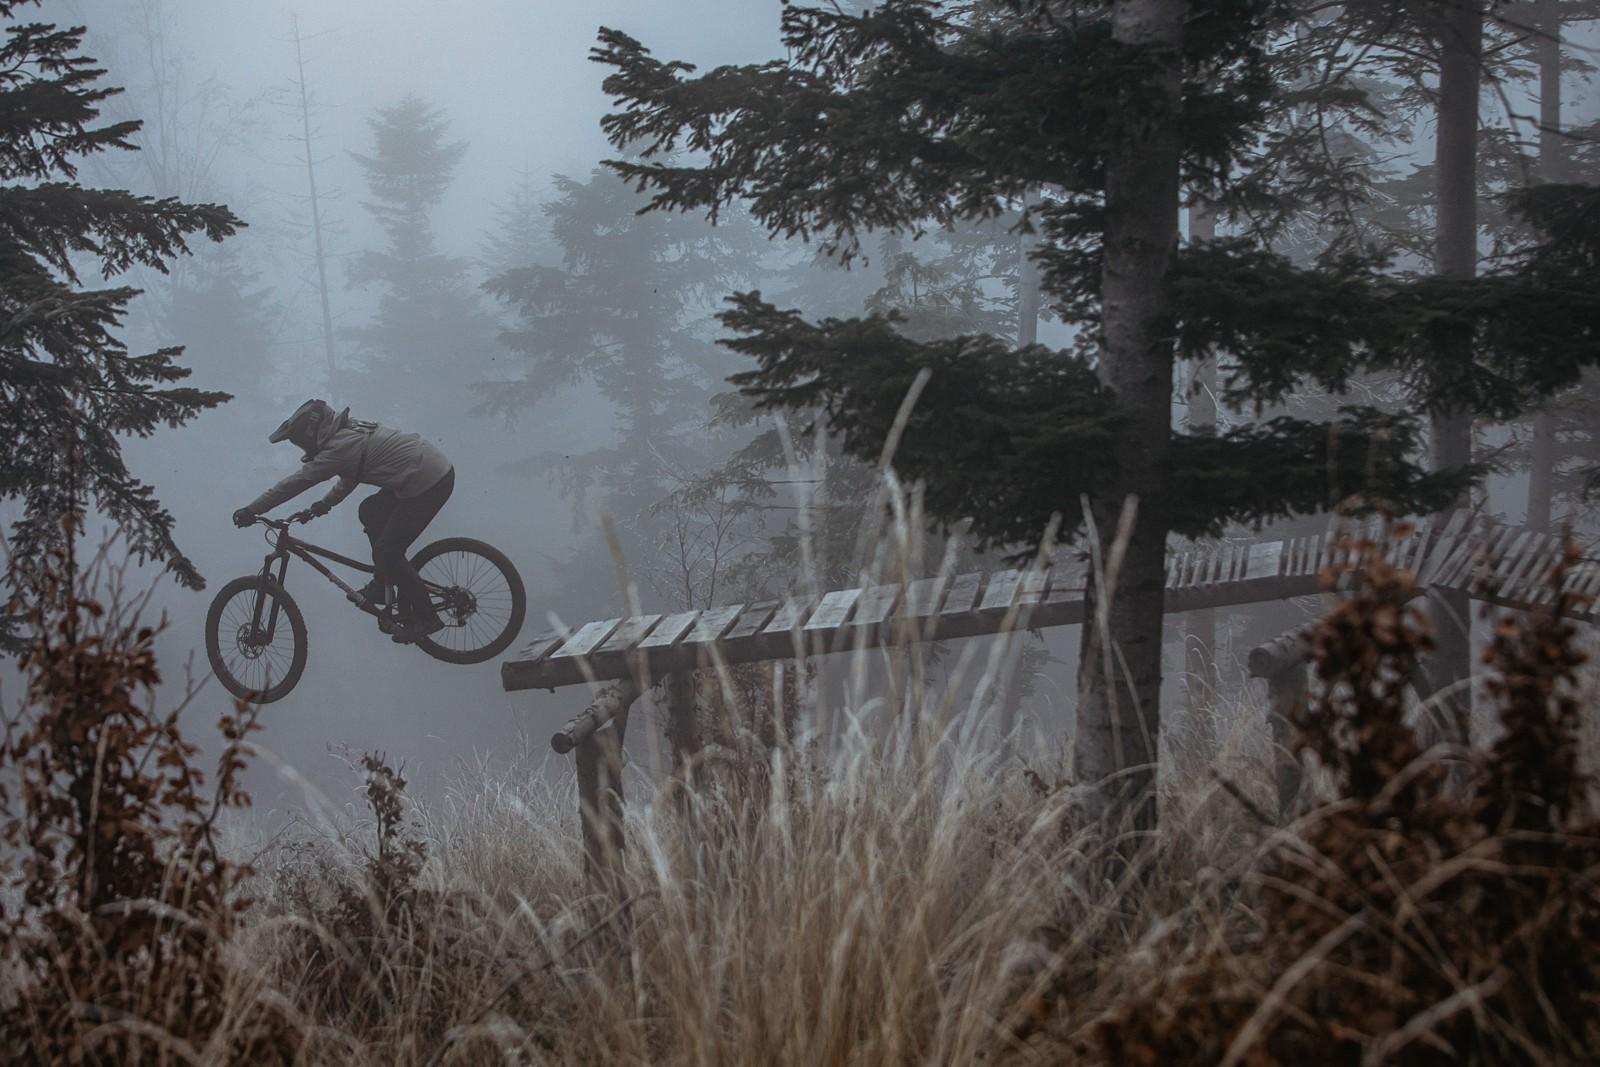 foggy - Banan - Mountain Biking Pictures - Vital MTB